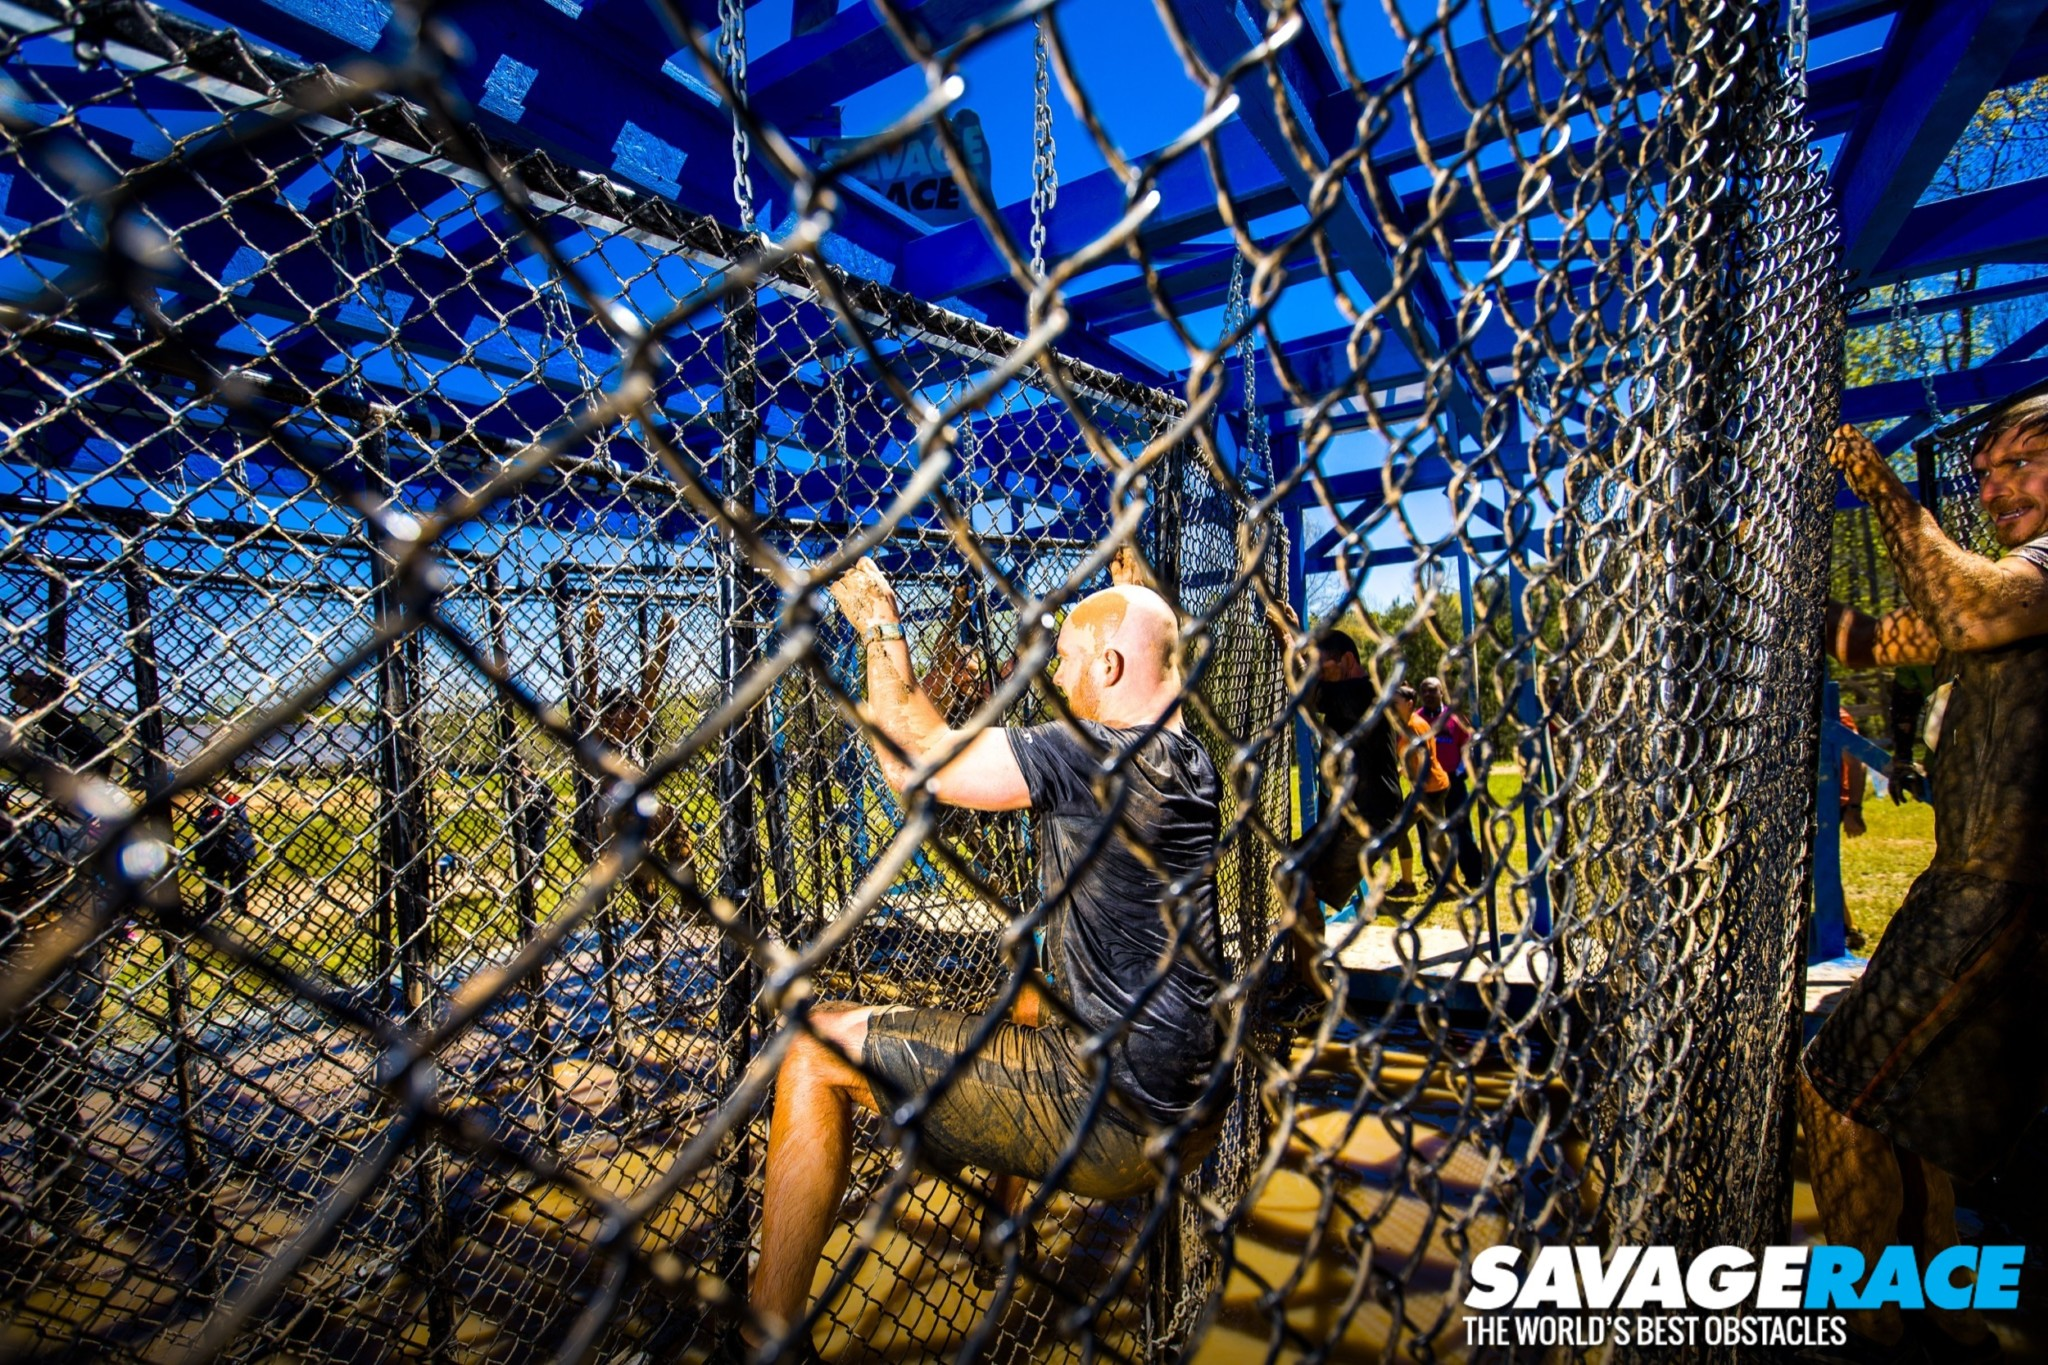 Savage Race On The Fence